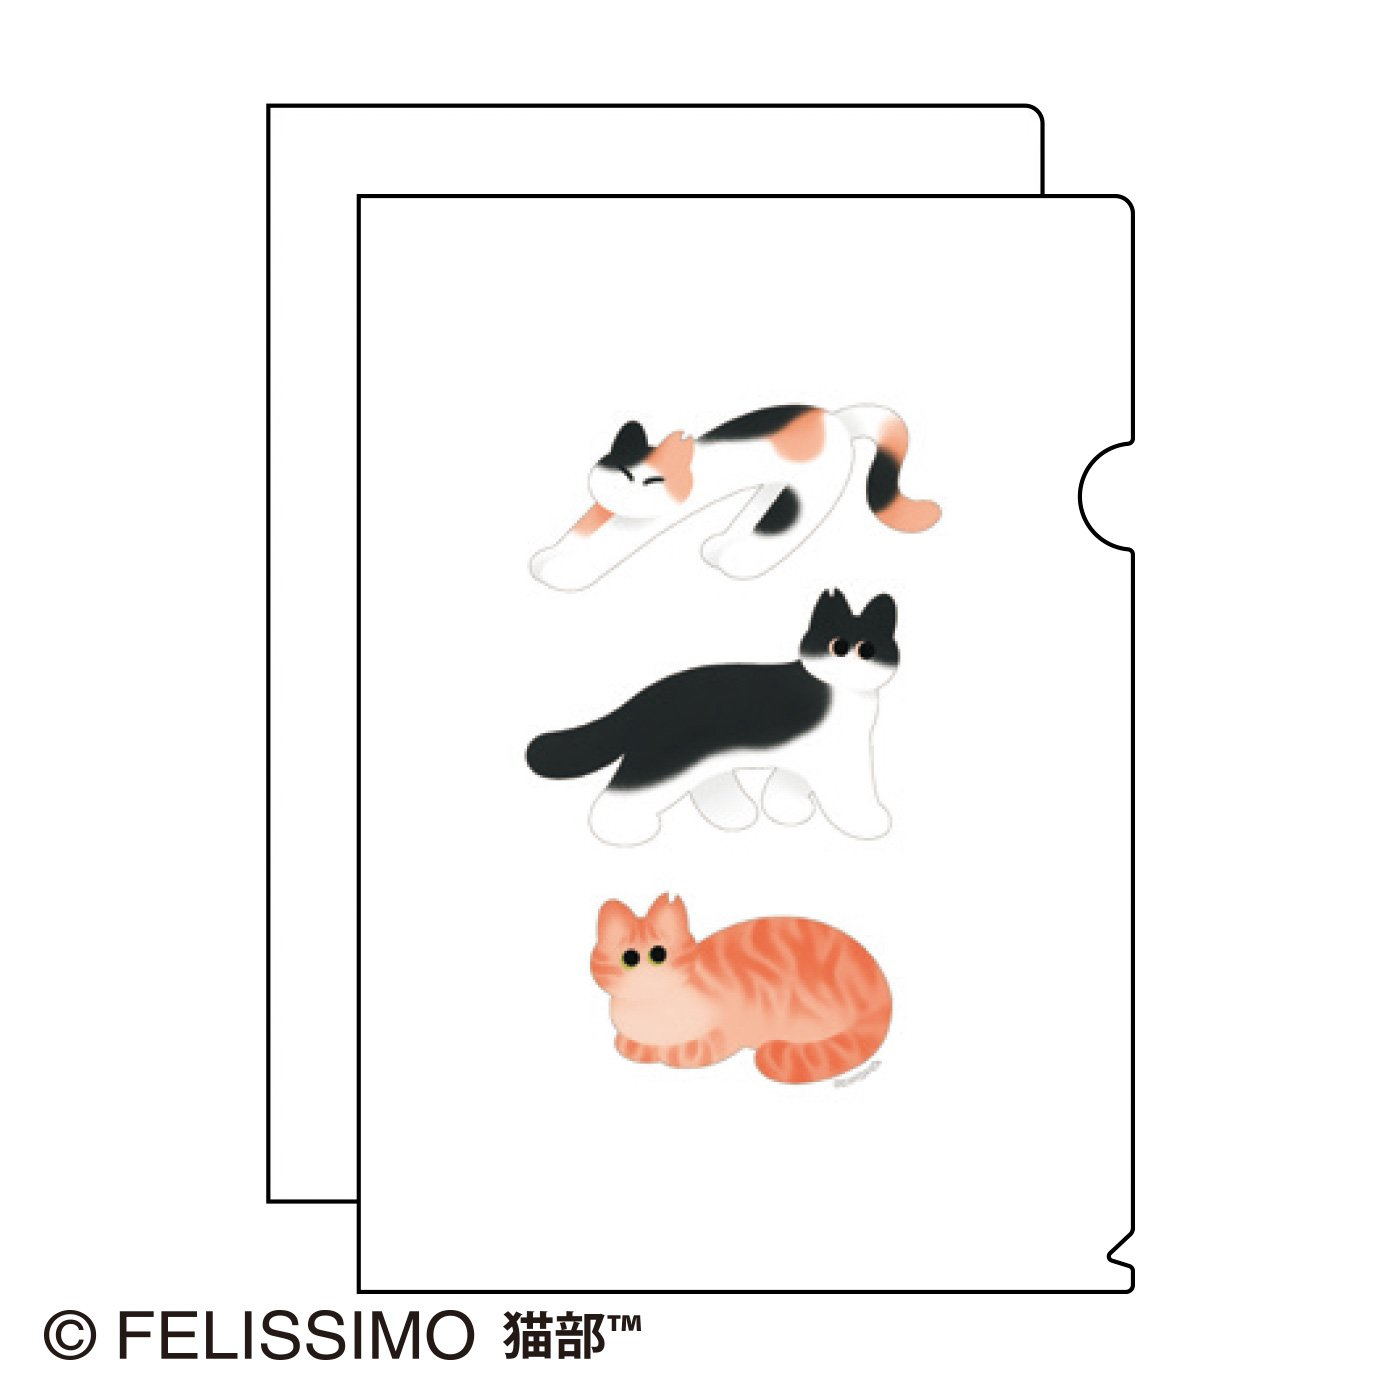 nanana×猫部 地域猫チャリティークリアファイル2021